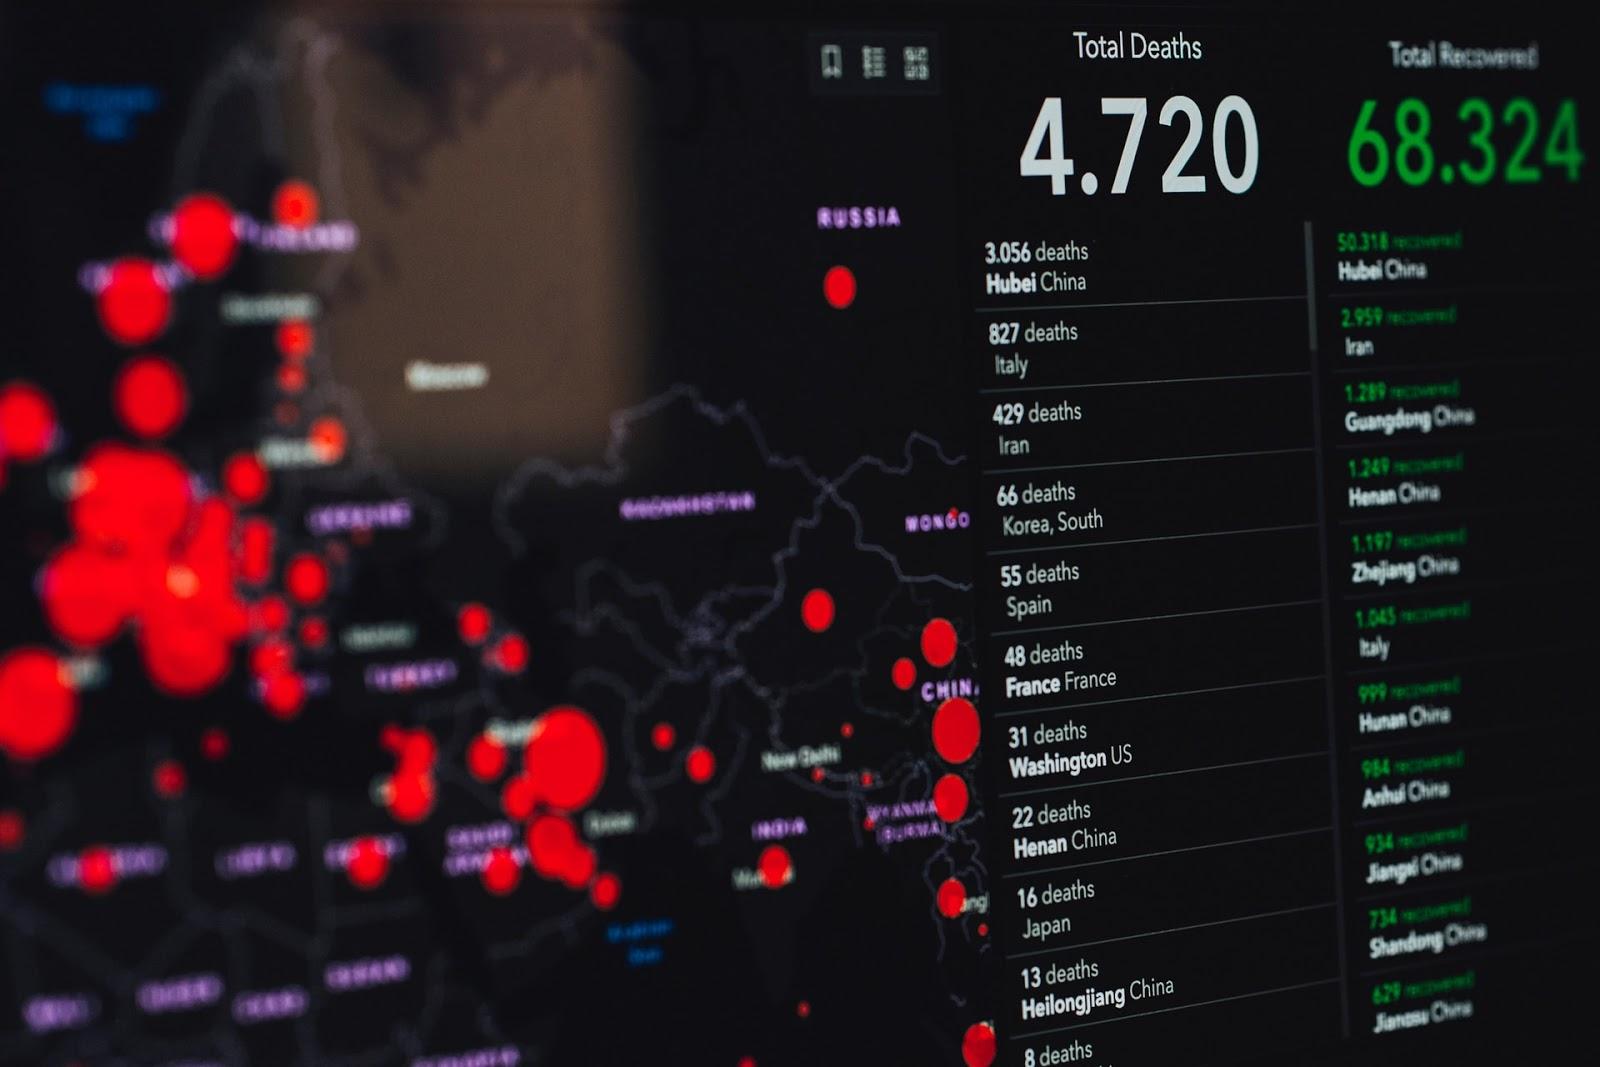 Johns Hopkins COVID-19 tracking dashboard